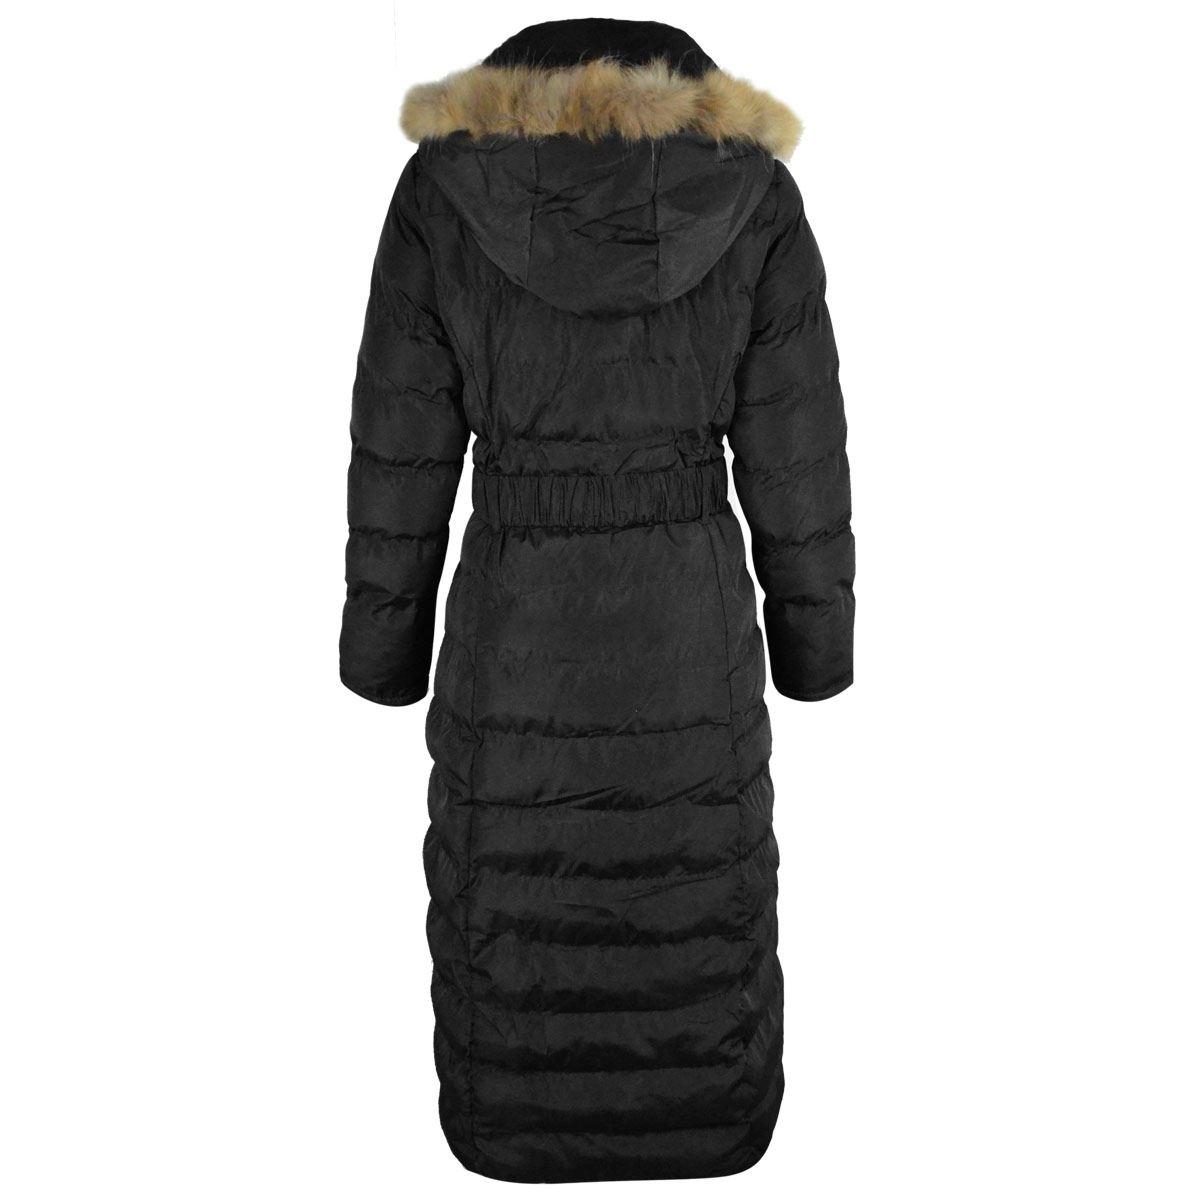 Full length womens winter coats